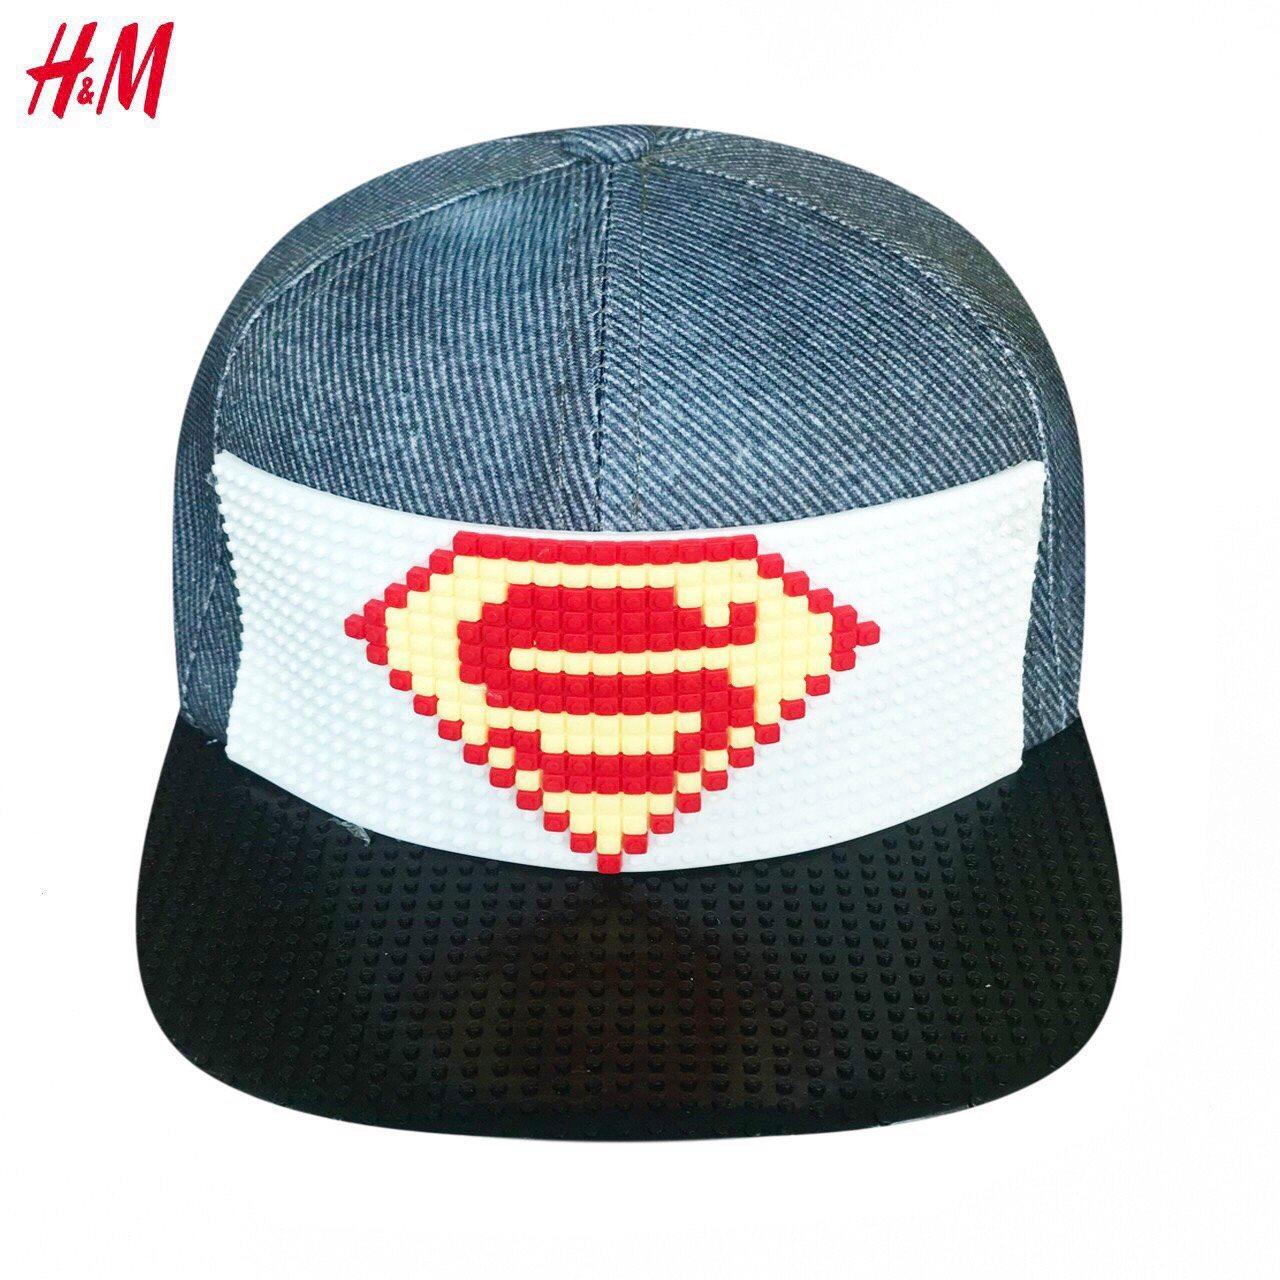 Nón H&M BaBy Boy - Xanh Jean/Superman